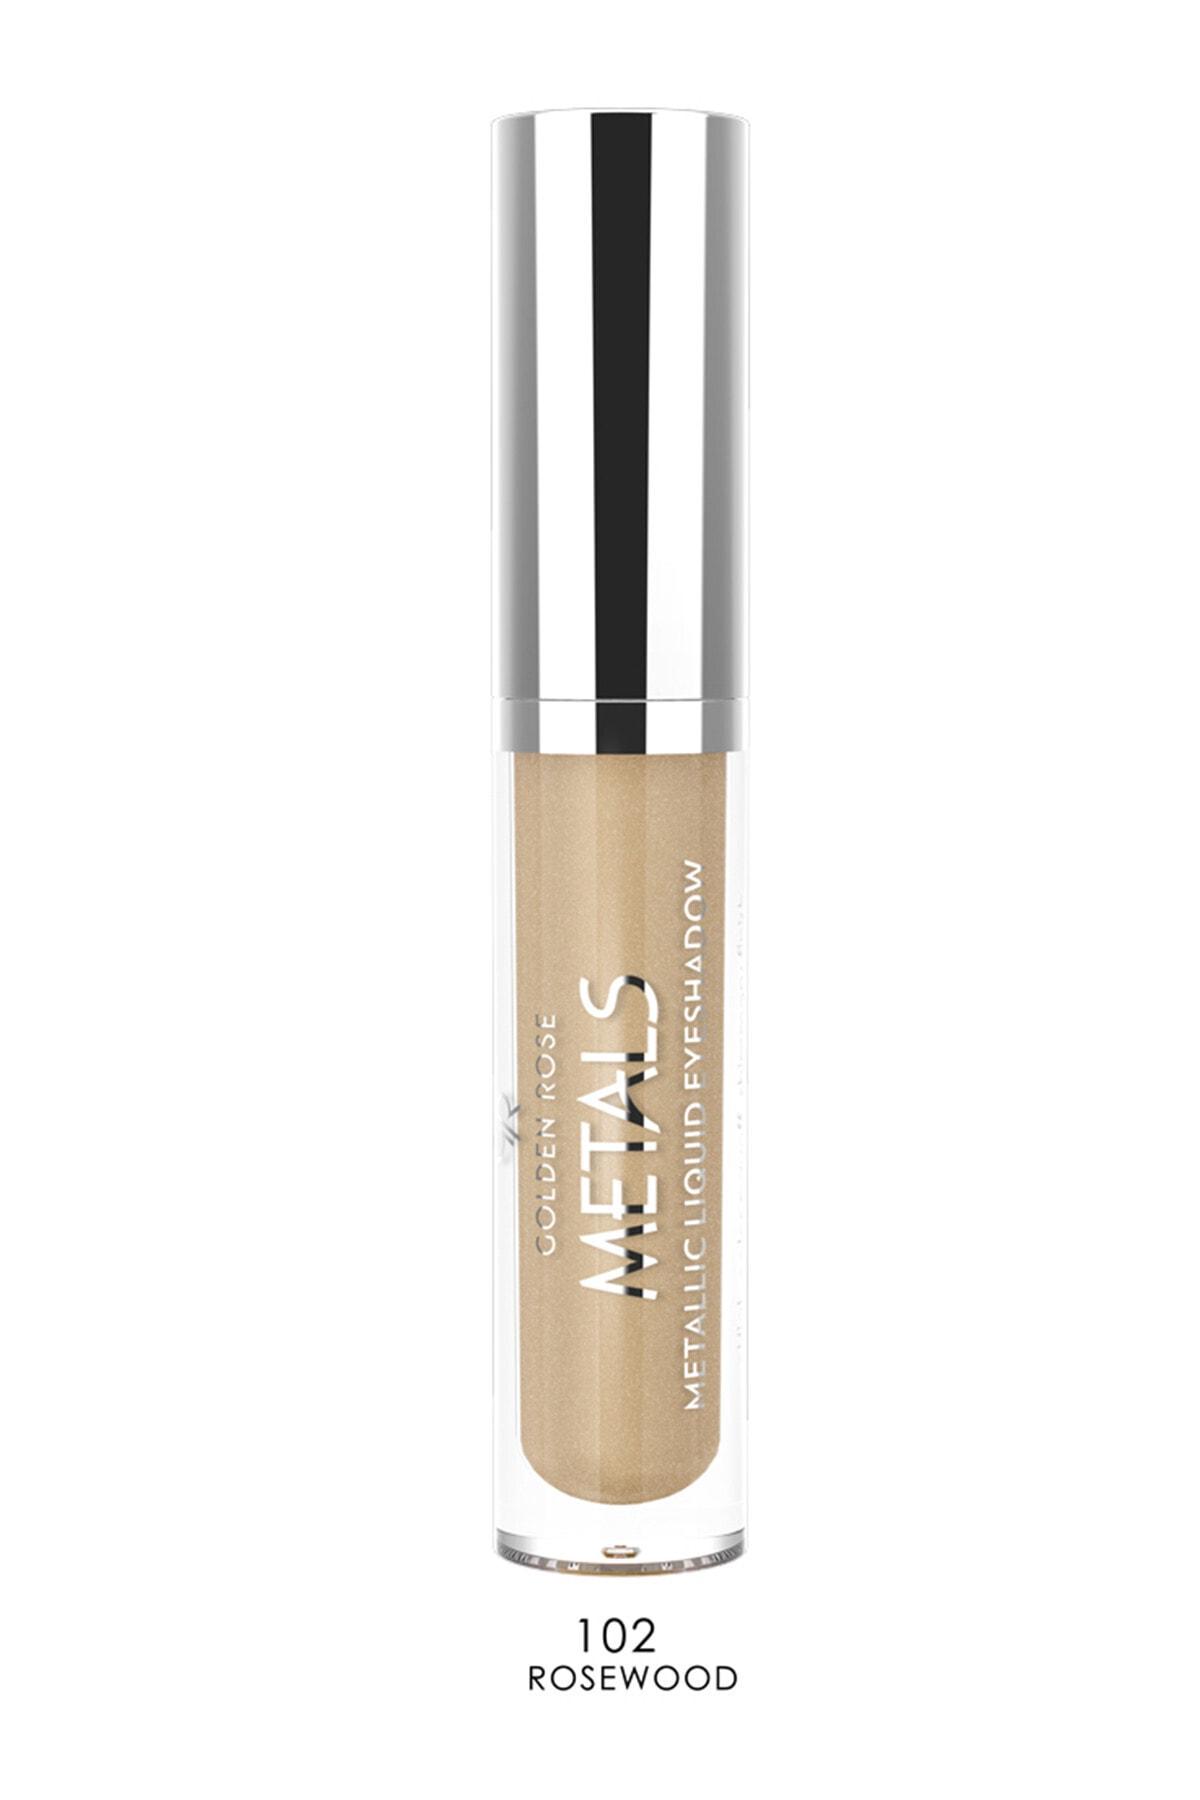 Golden Rose Likit Metalik Göz Farı - Metals Metallic Liquid Eyeshadow No: 102 Rosewood 8691190137526 1